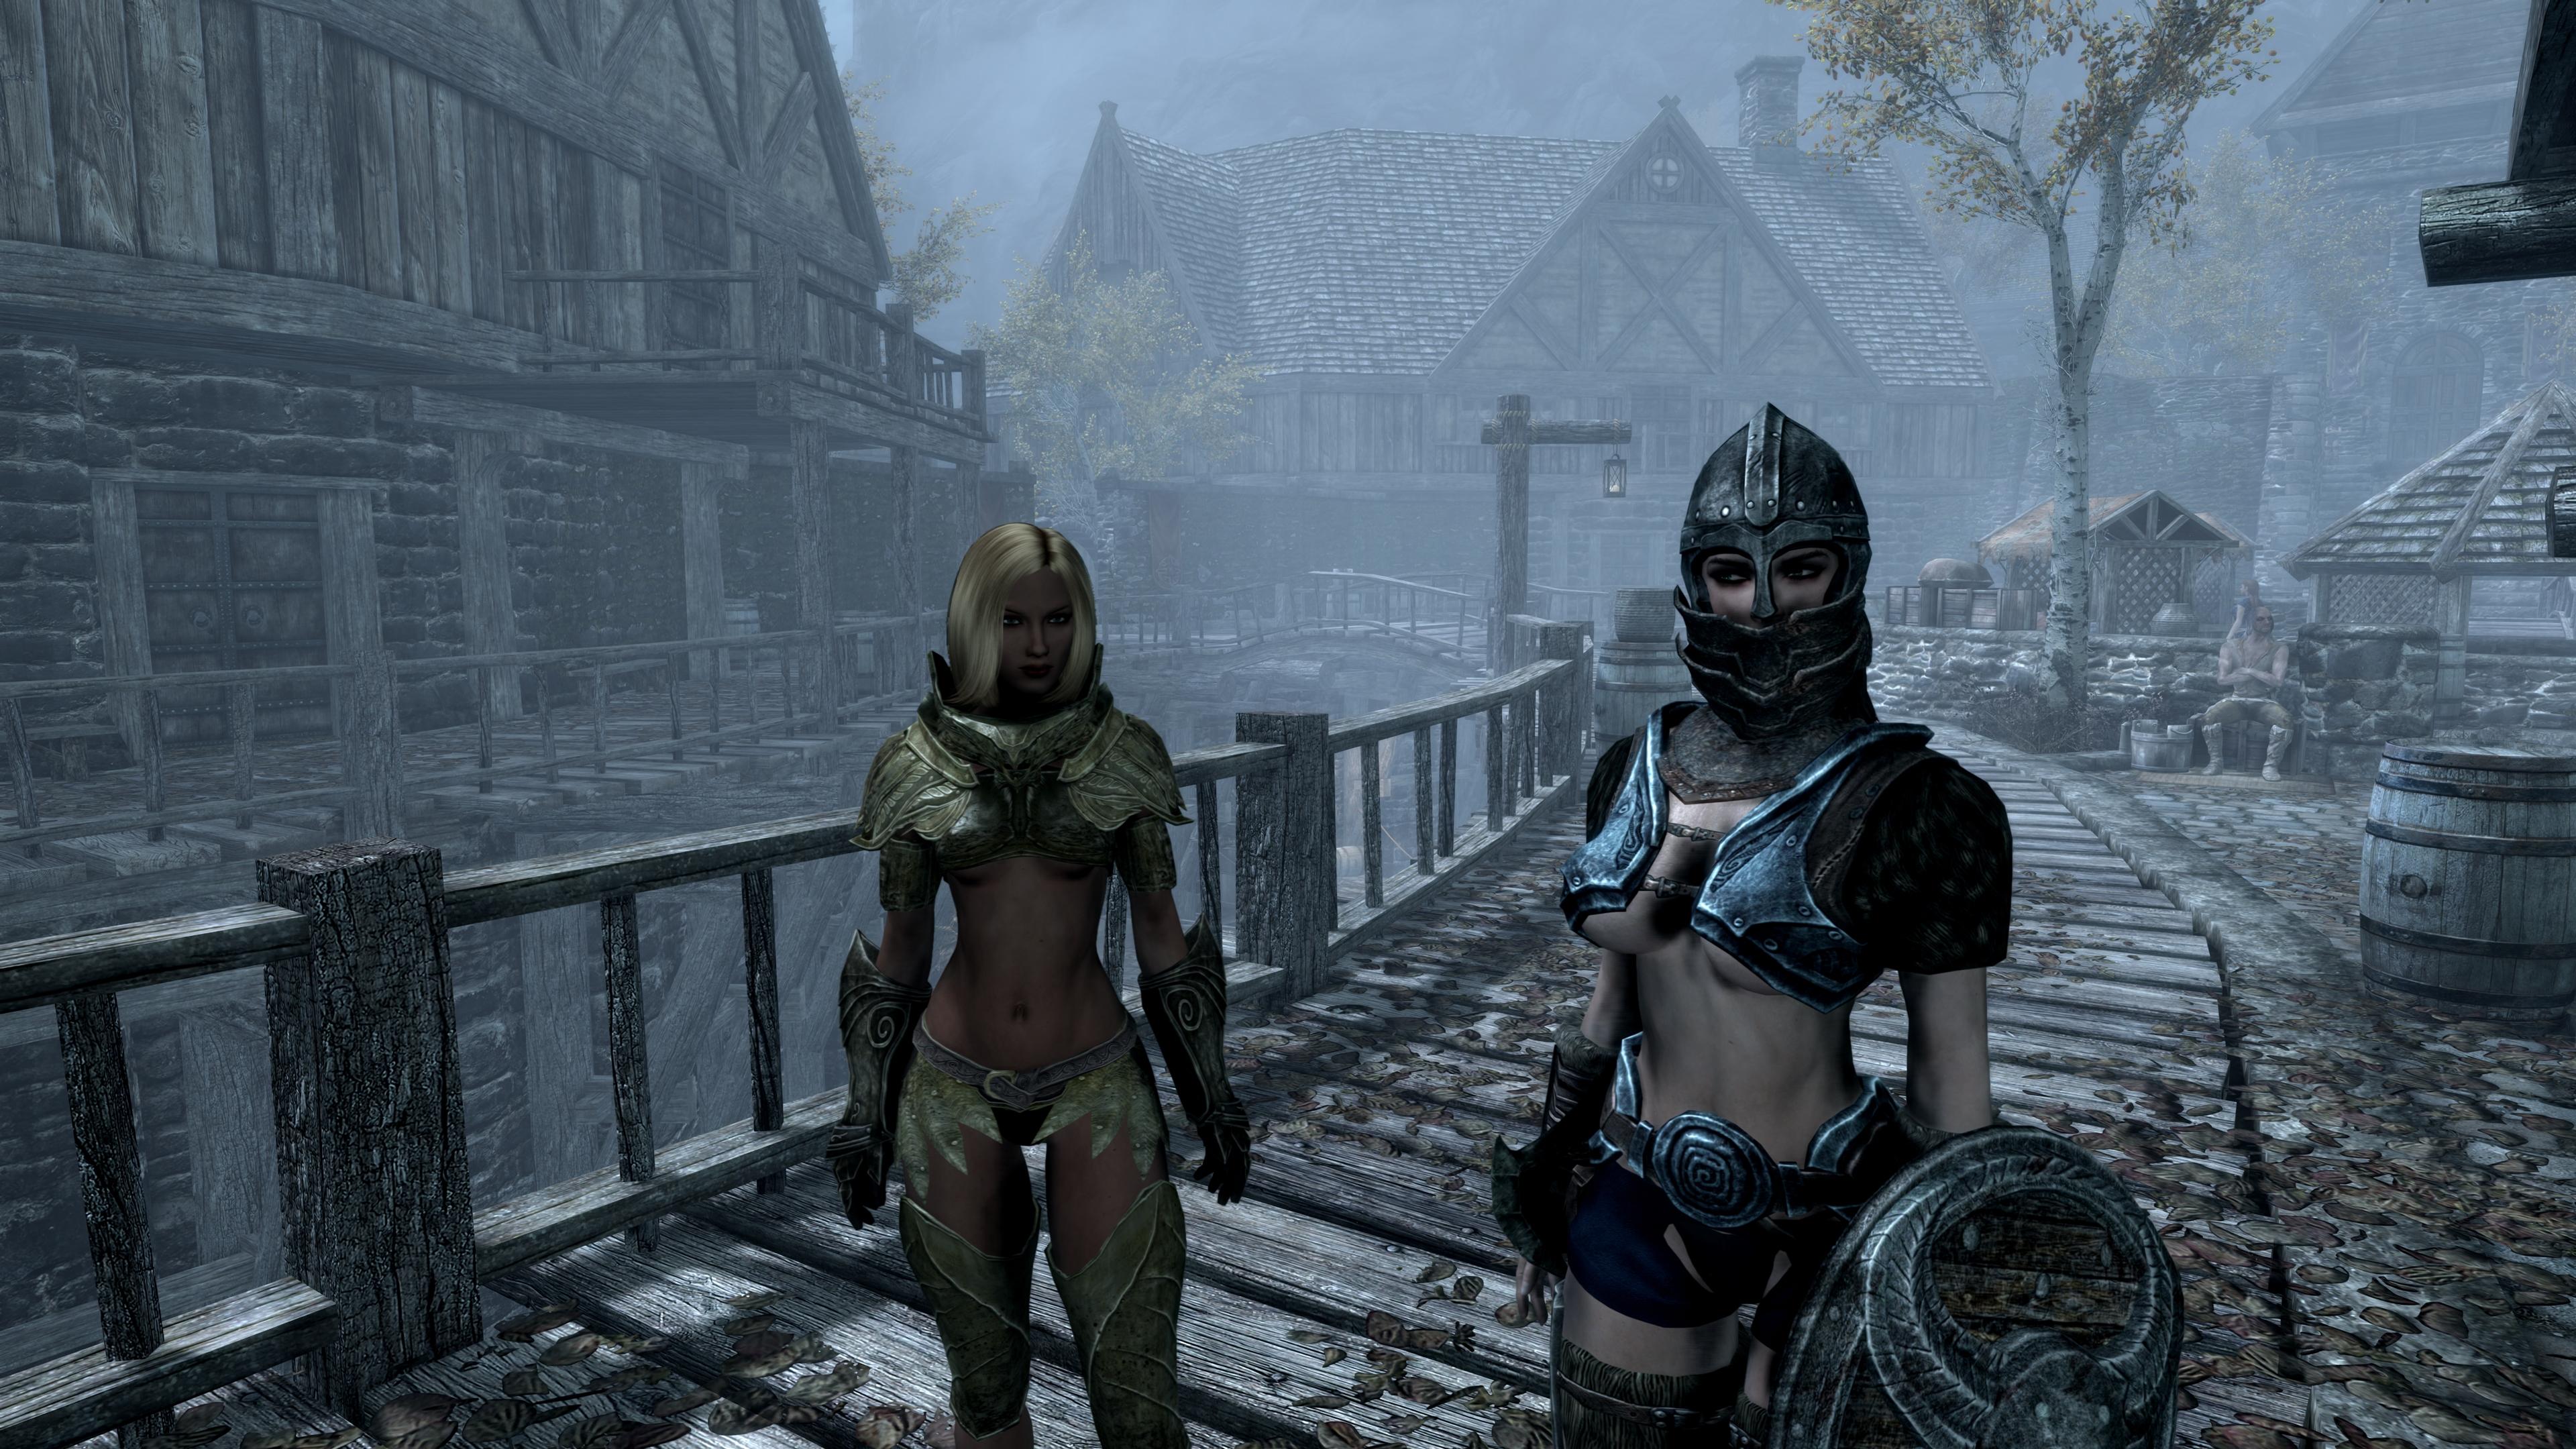 The Elder Scrolls V Skyrim Special Edition 4k ultra graphics Nvidia GeForce RTX 2080 - Elder Scrolls 5: Skyrim, the